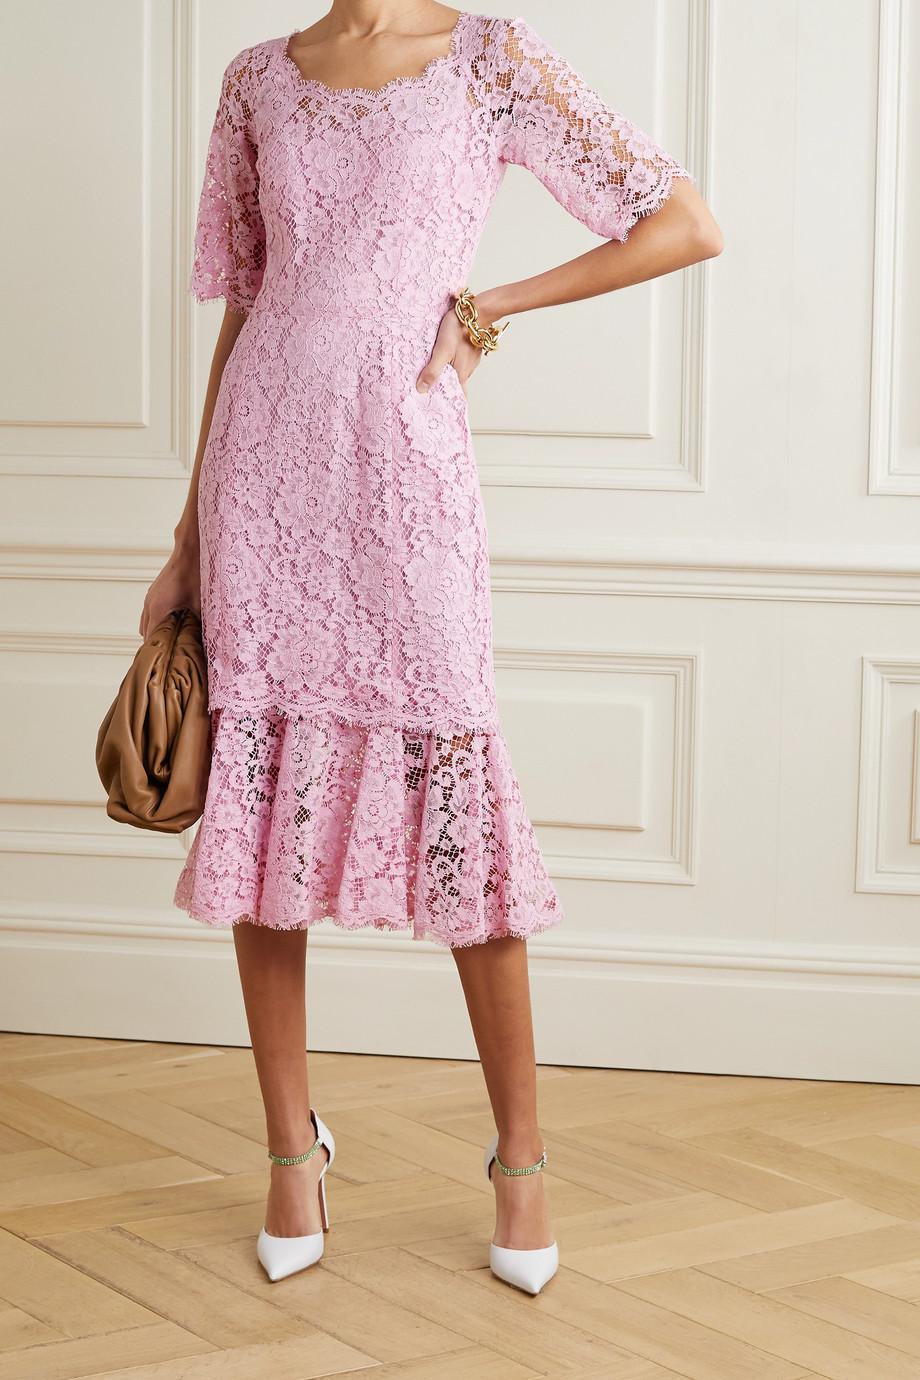 Dolce & Gabbana Tiered corded lace midi dress